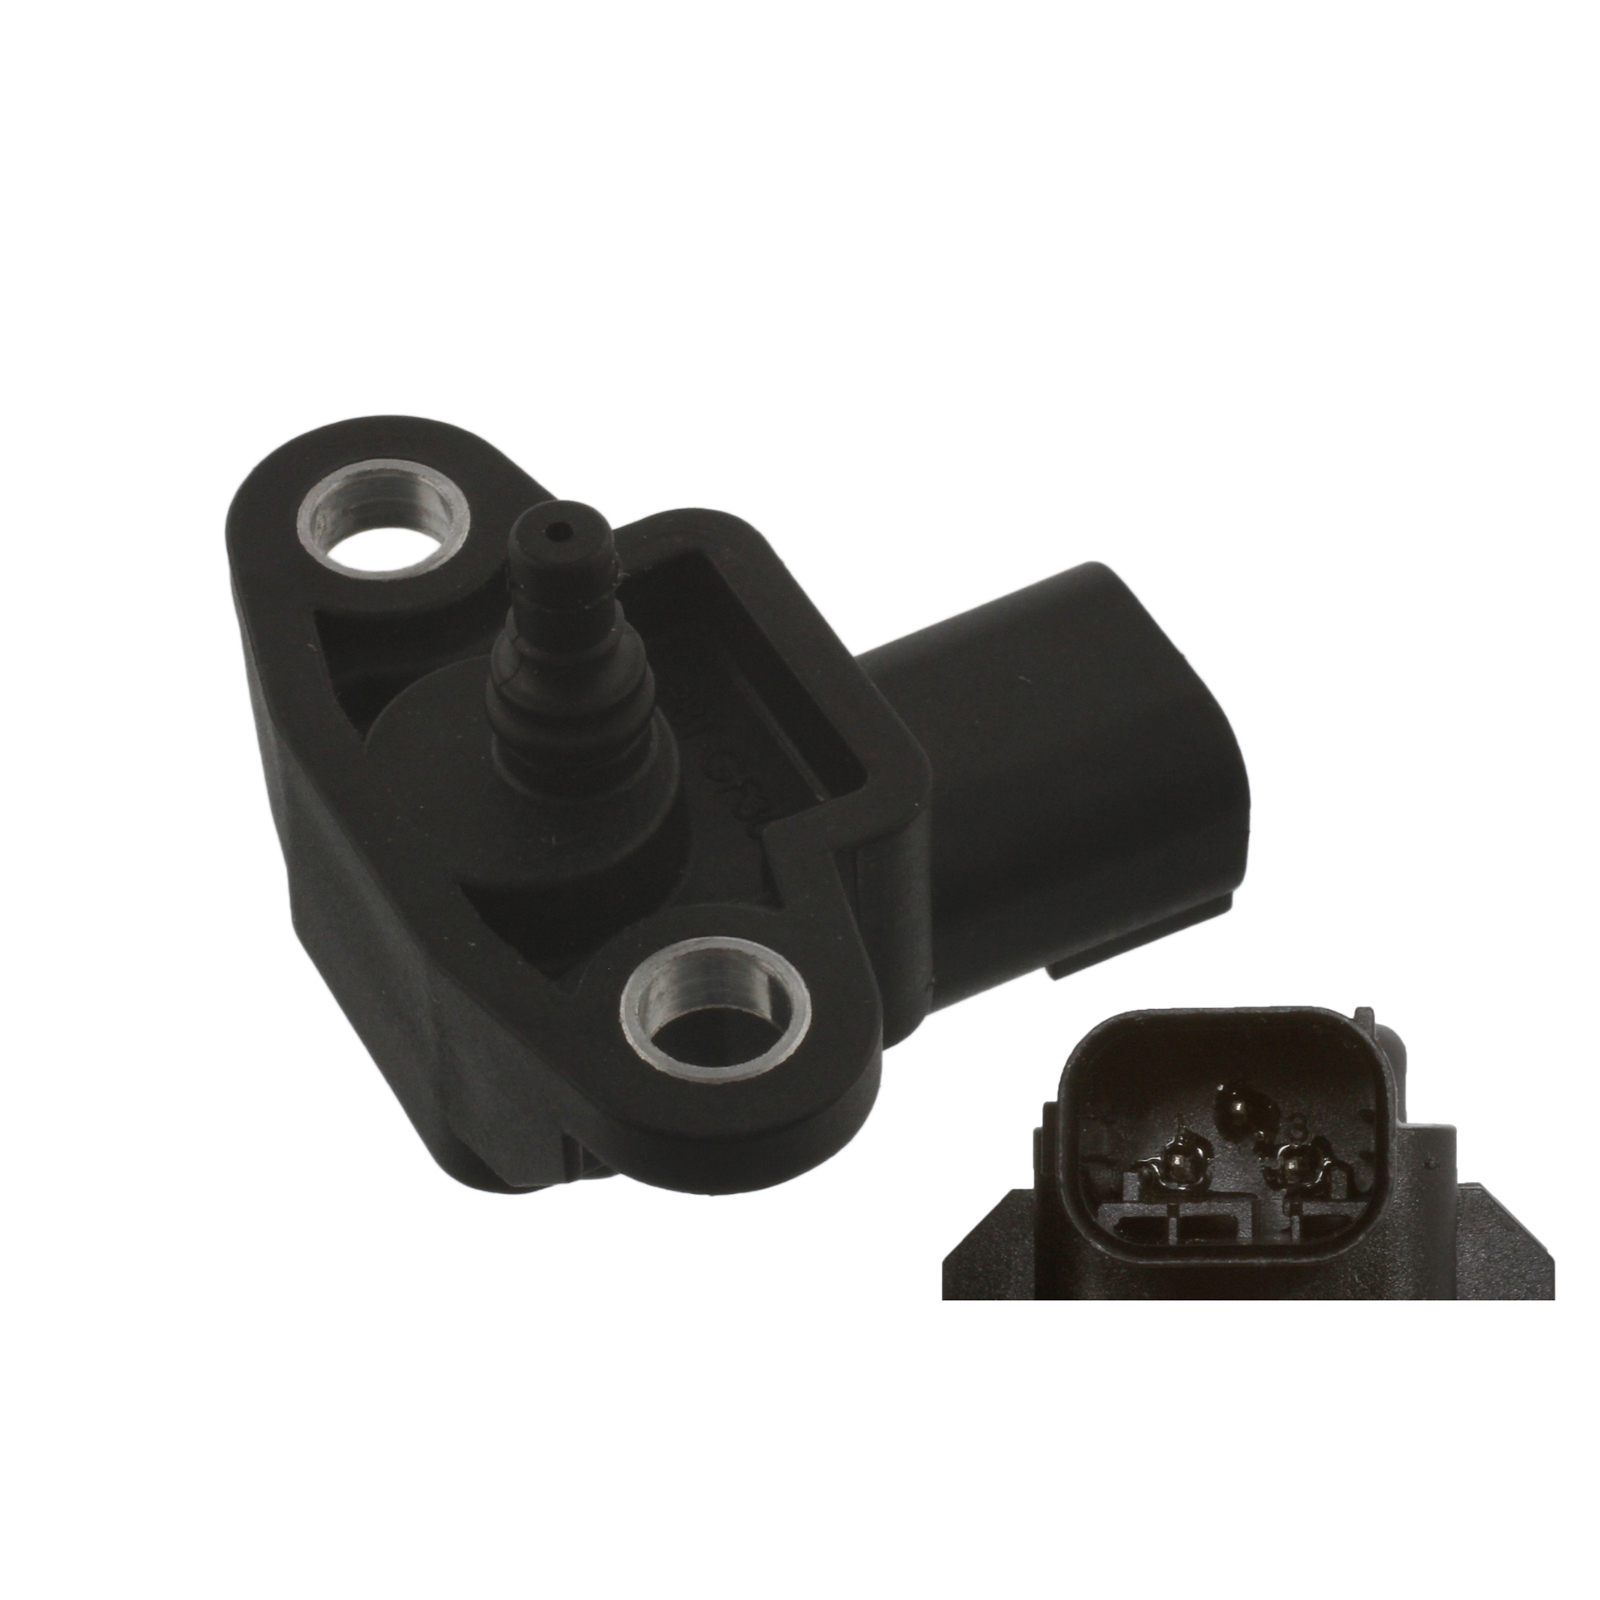 FEBI 37056 Saugrohrdrucksensor MERCEDES-BENZ W168 W202 S210 W163 C215 Viano 906 0041533028